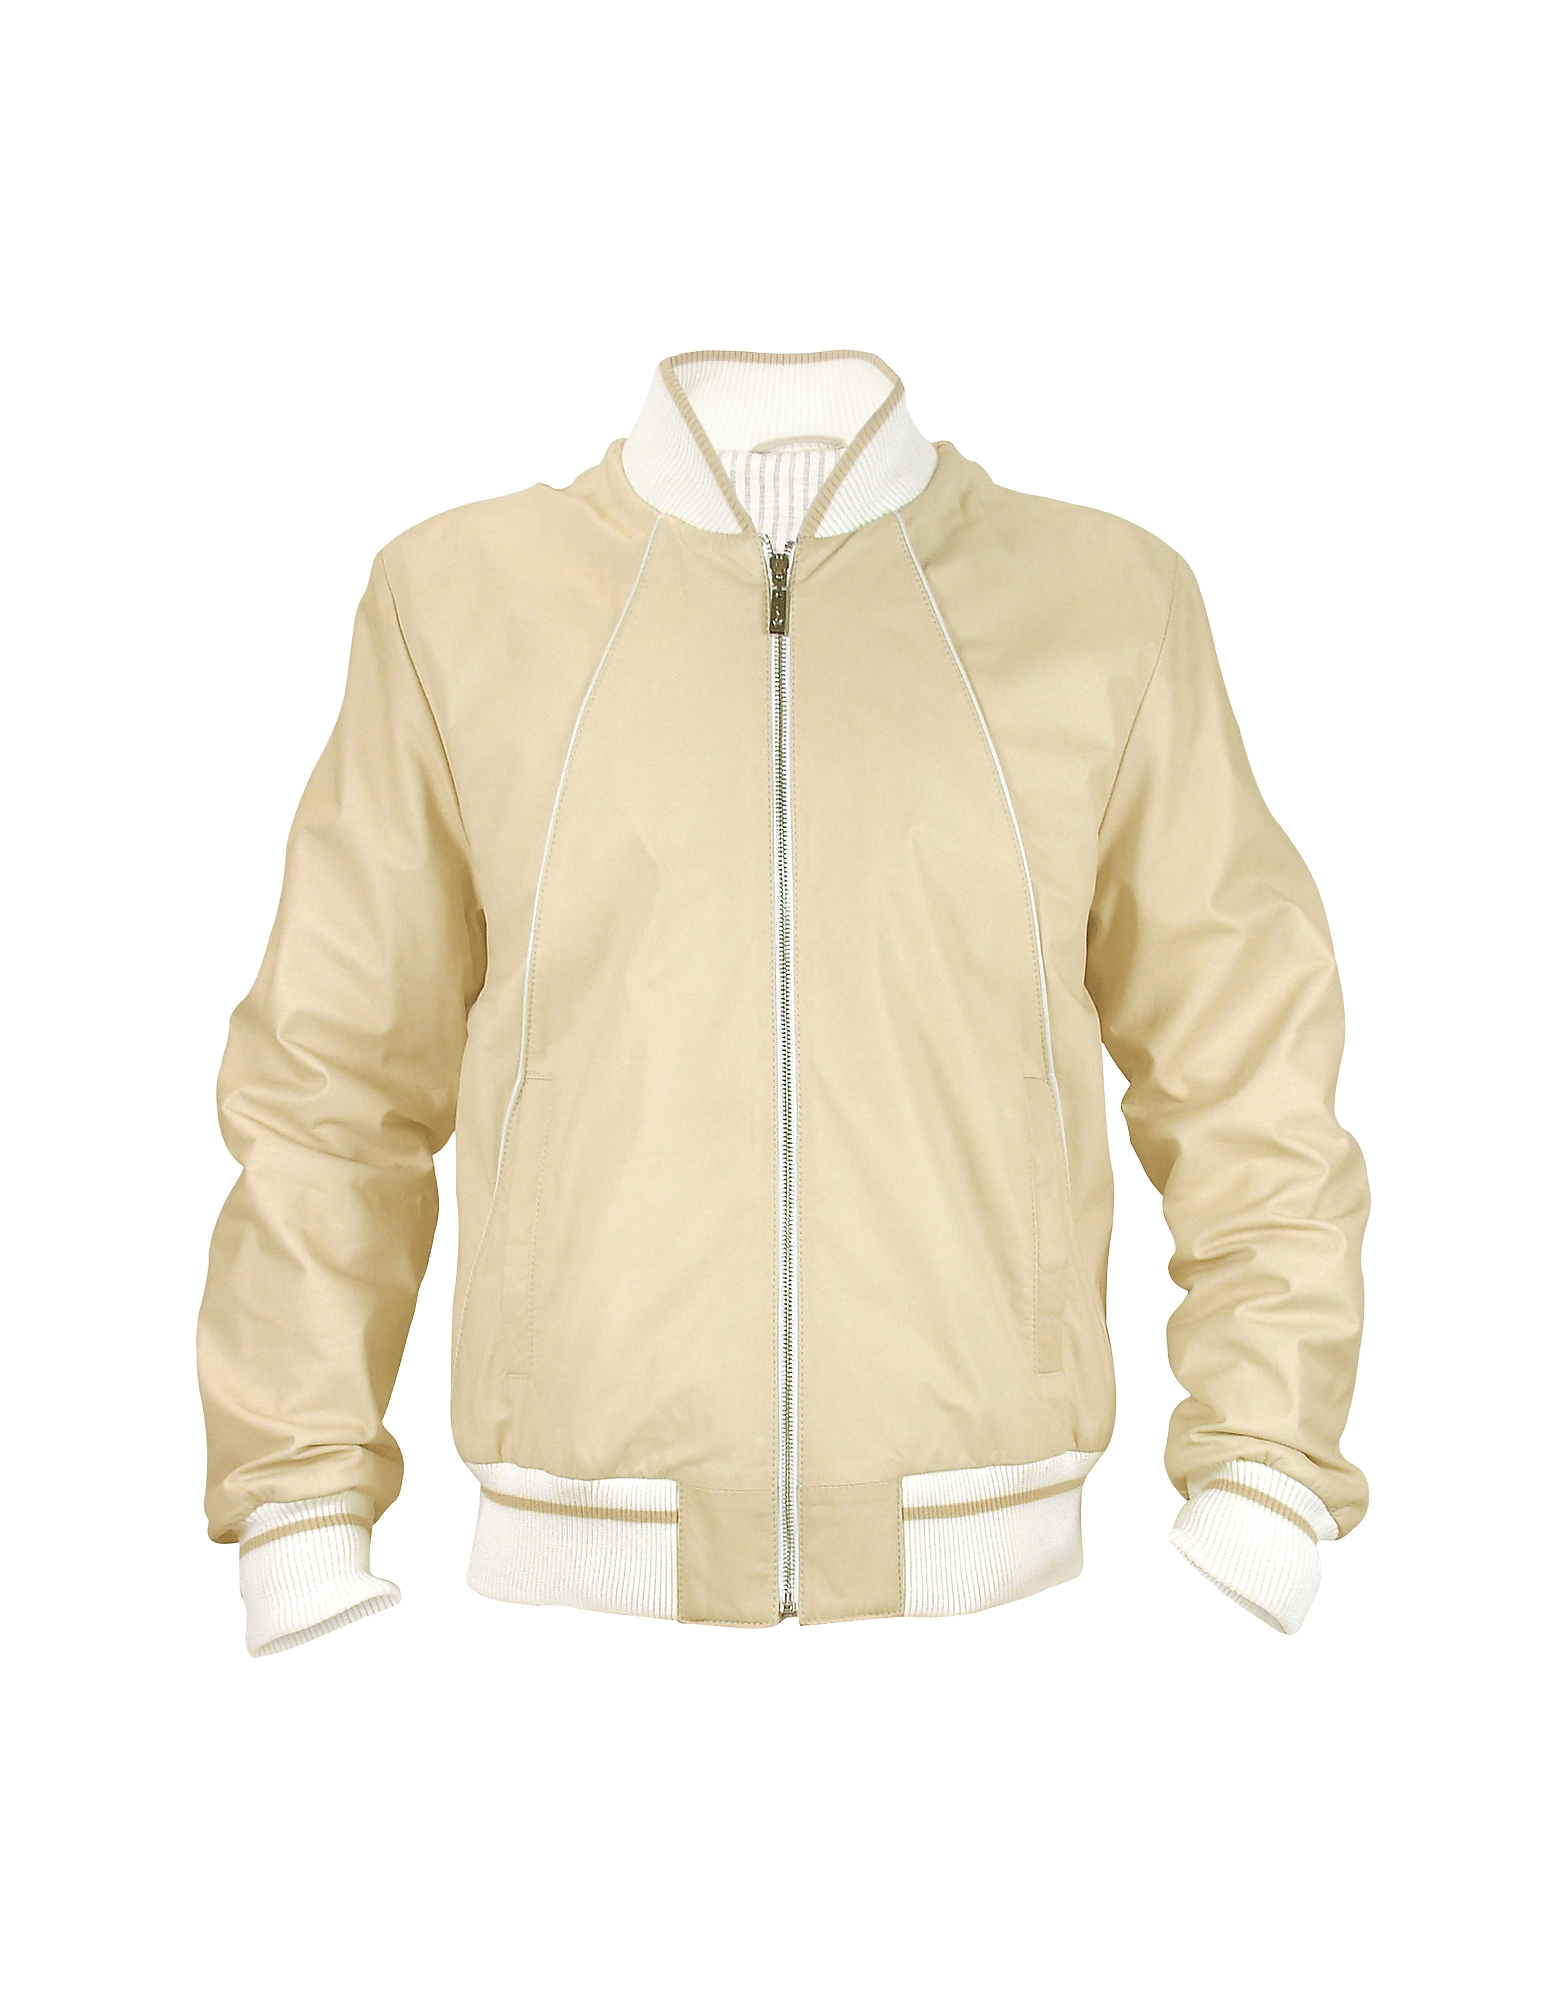 Мужская Бежевая Куртка из Кожи Наппа на Молнии